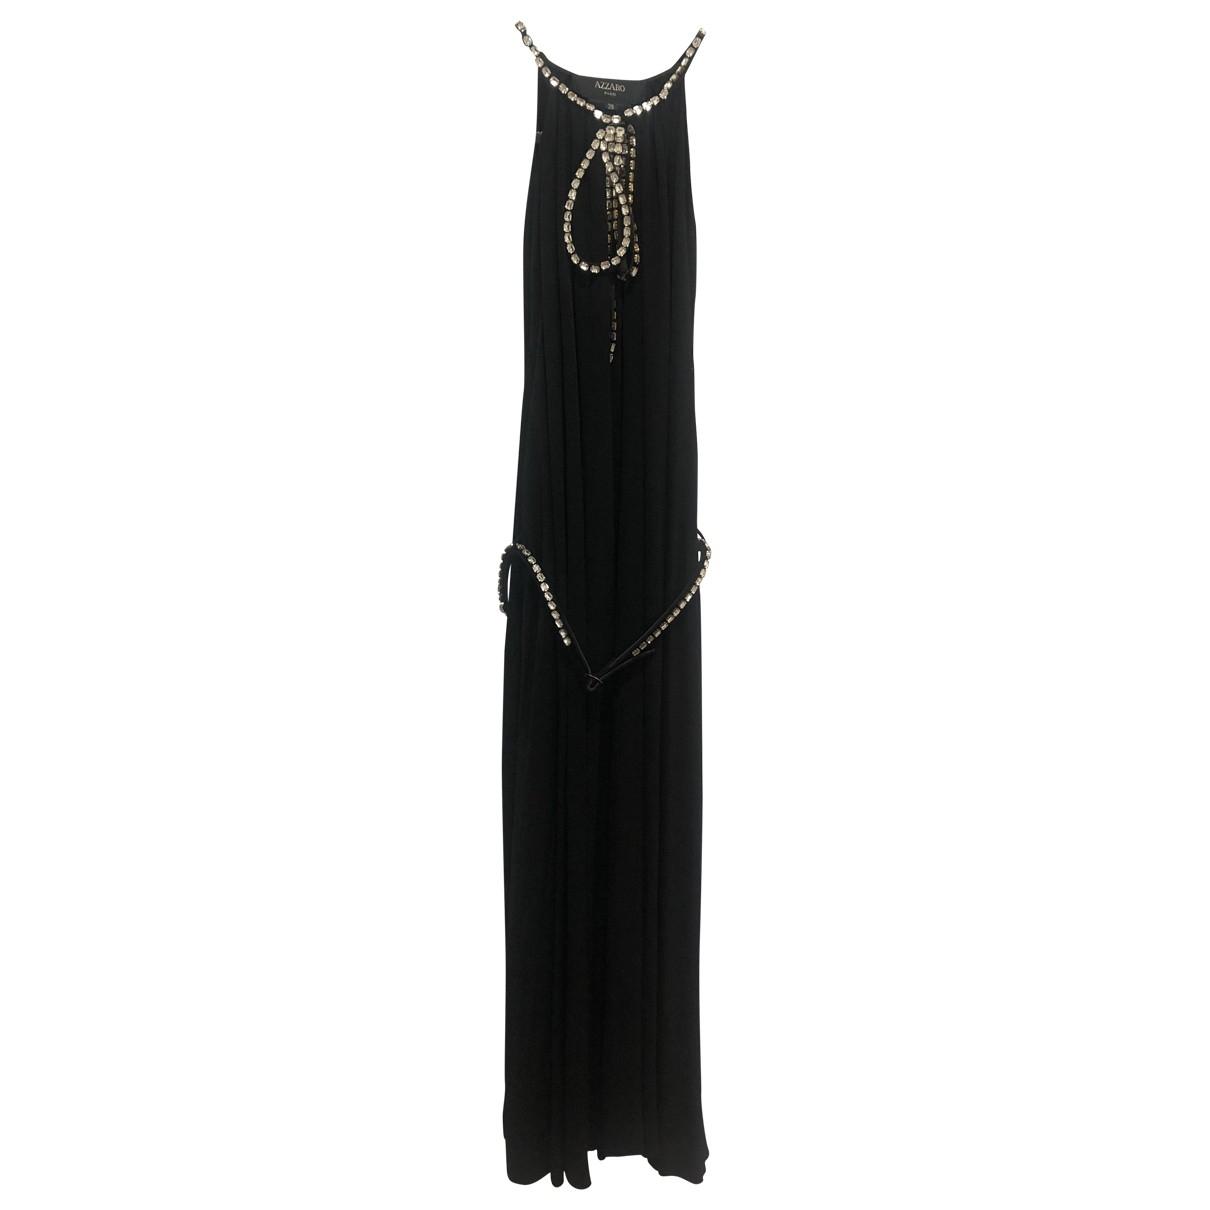 Azzaro \N Kleid in  Schwarz Viskose